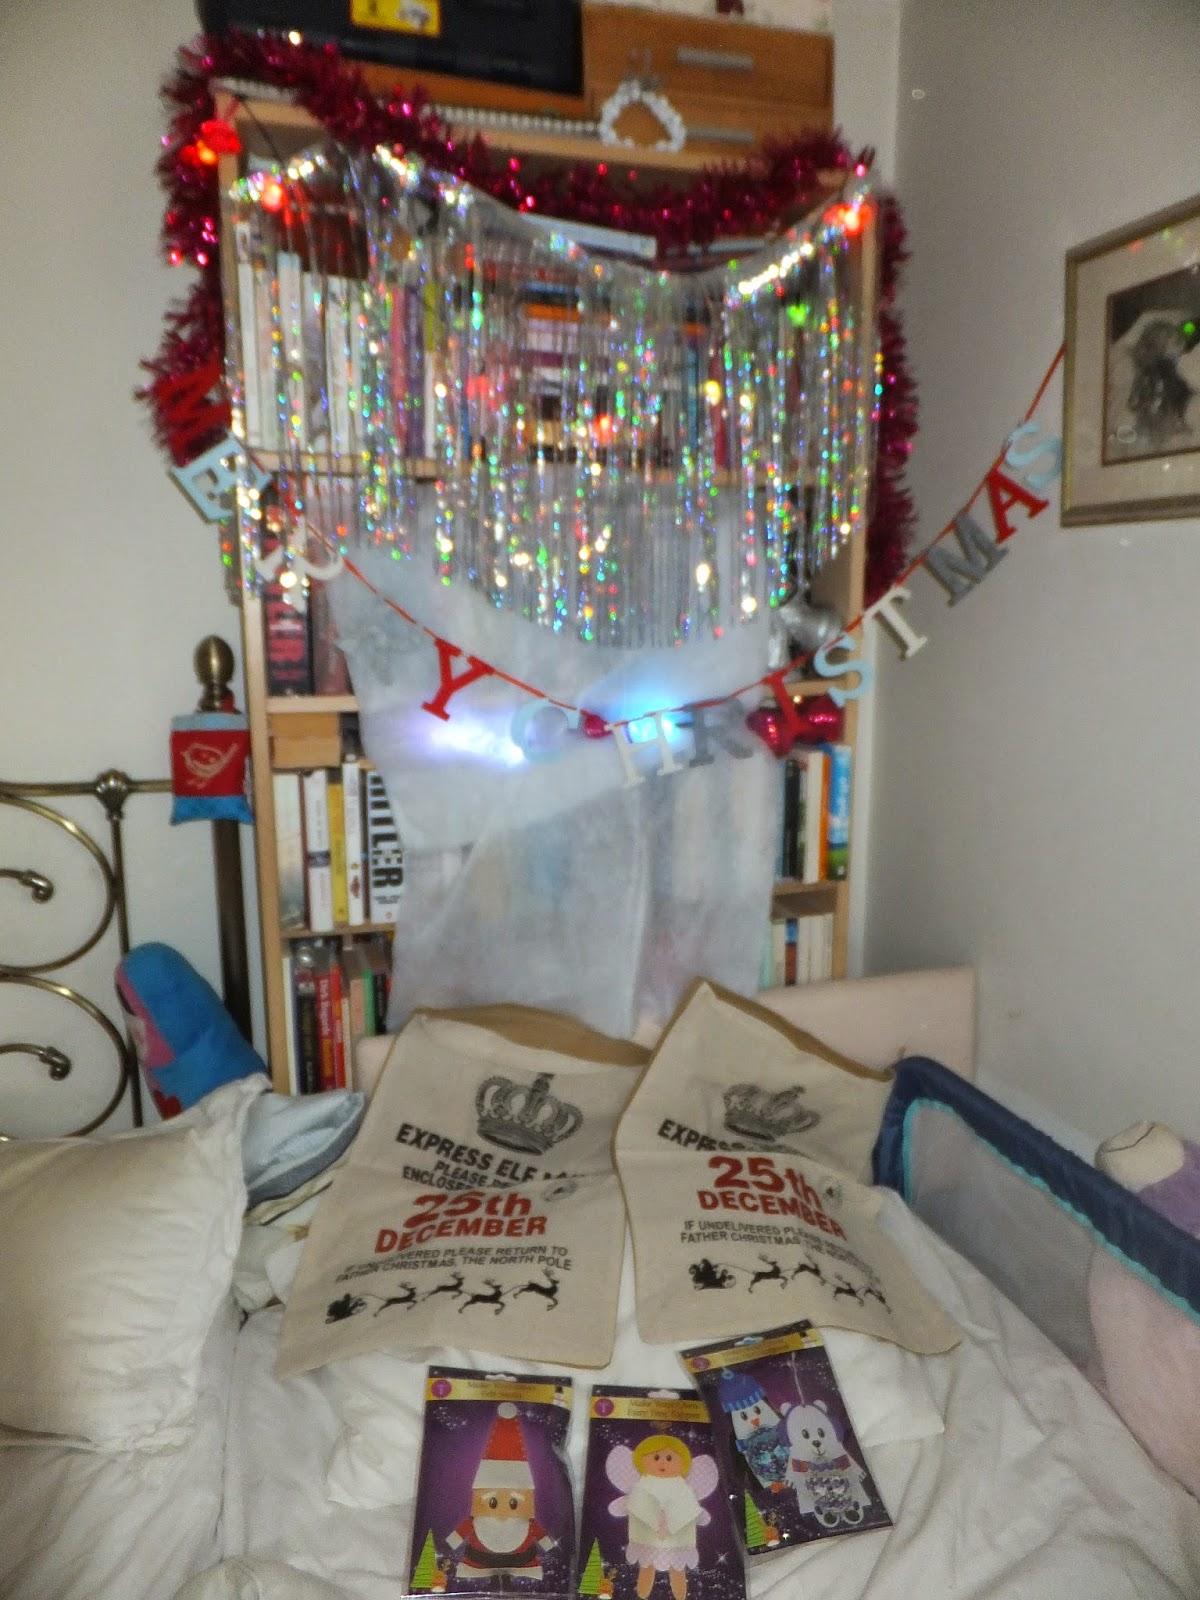 Christmas Decorations Poundland : Decorating for christmas with poundland